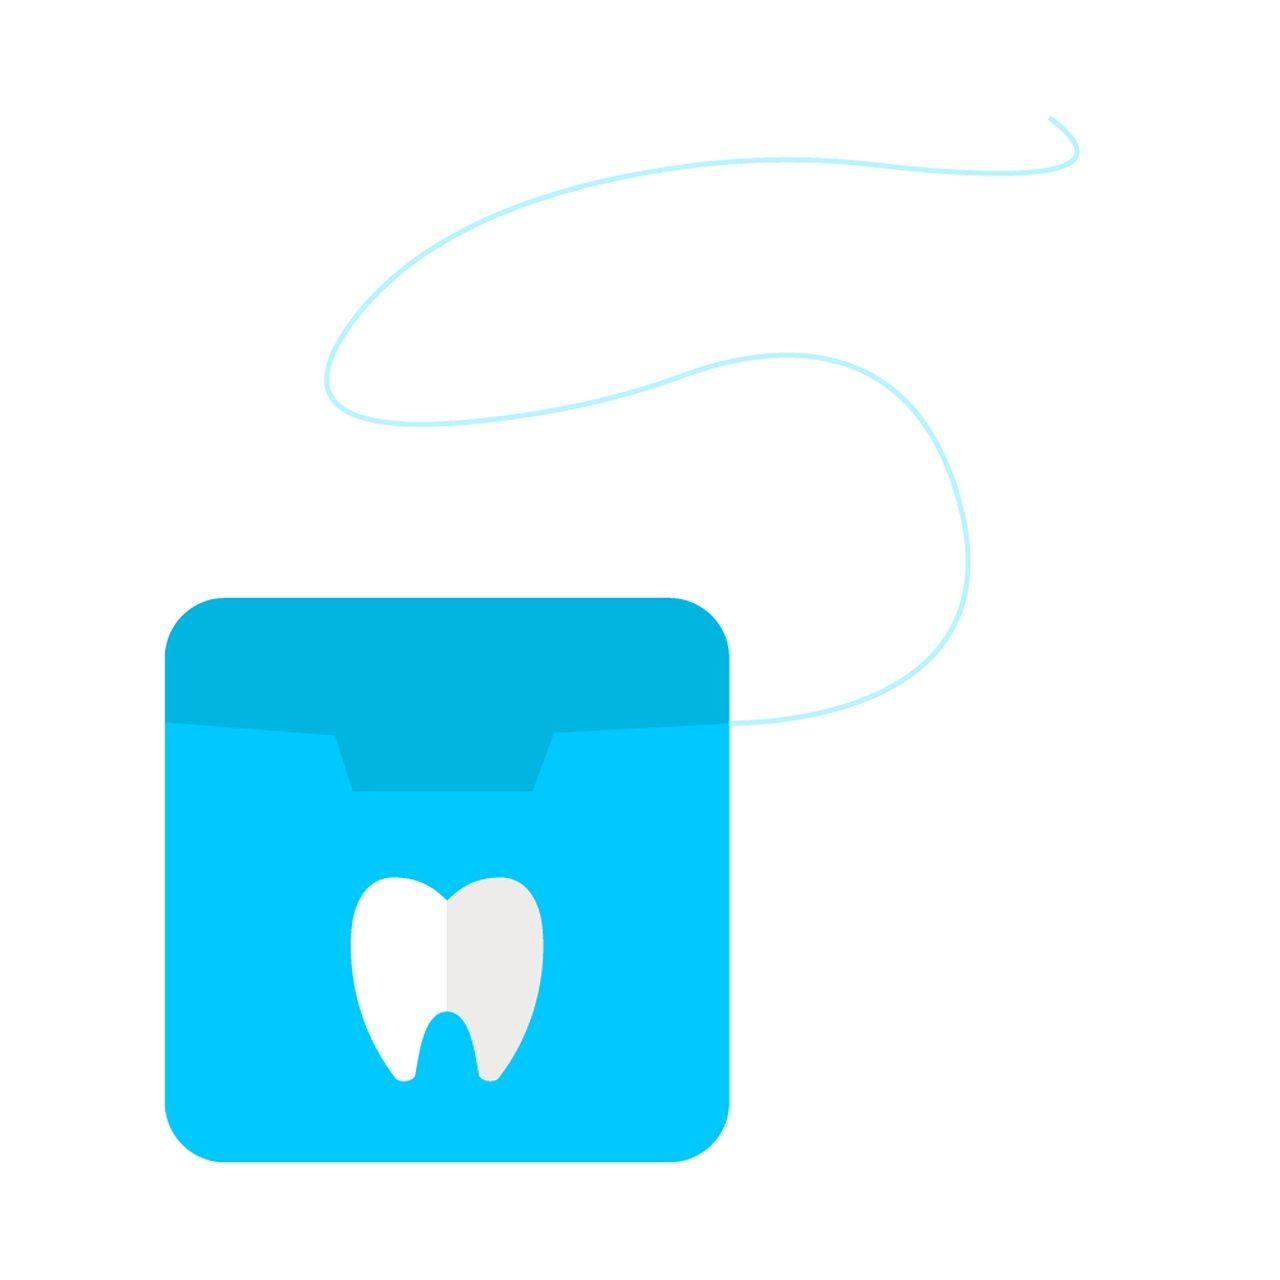 J C Bakker tandarts spoed